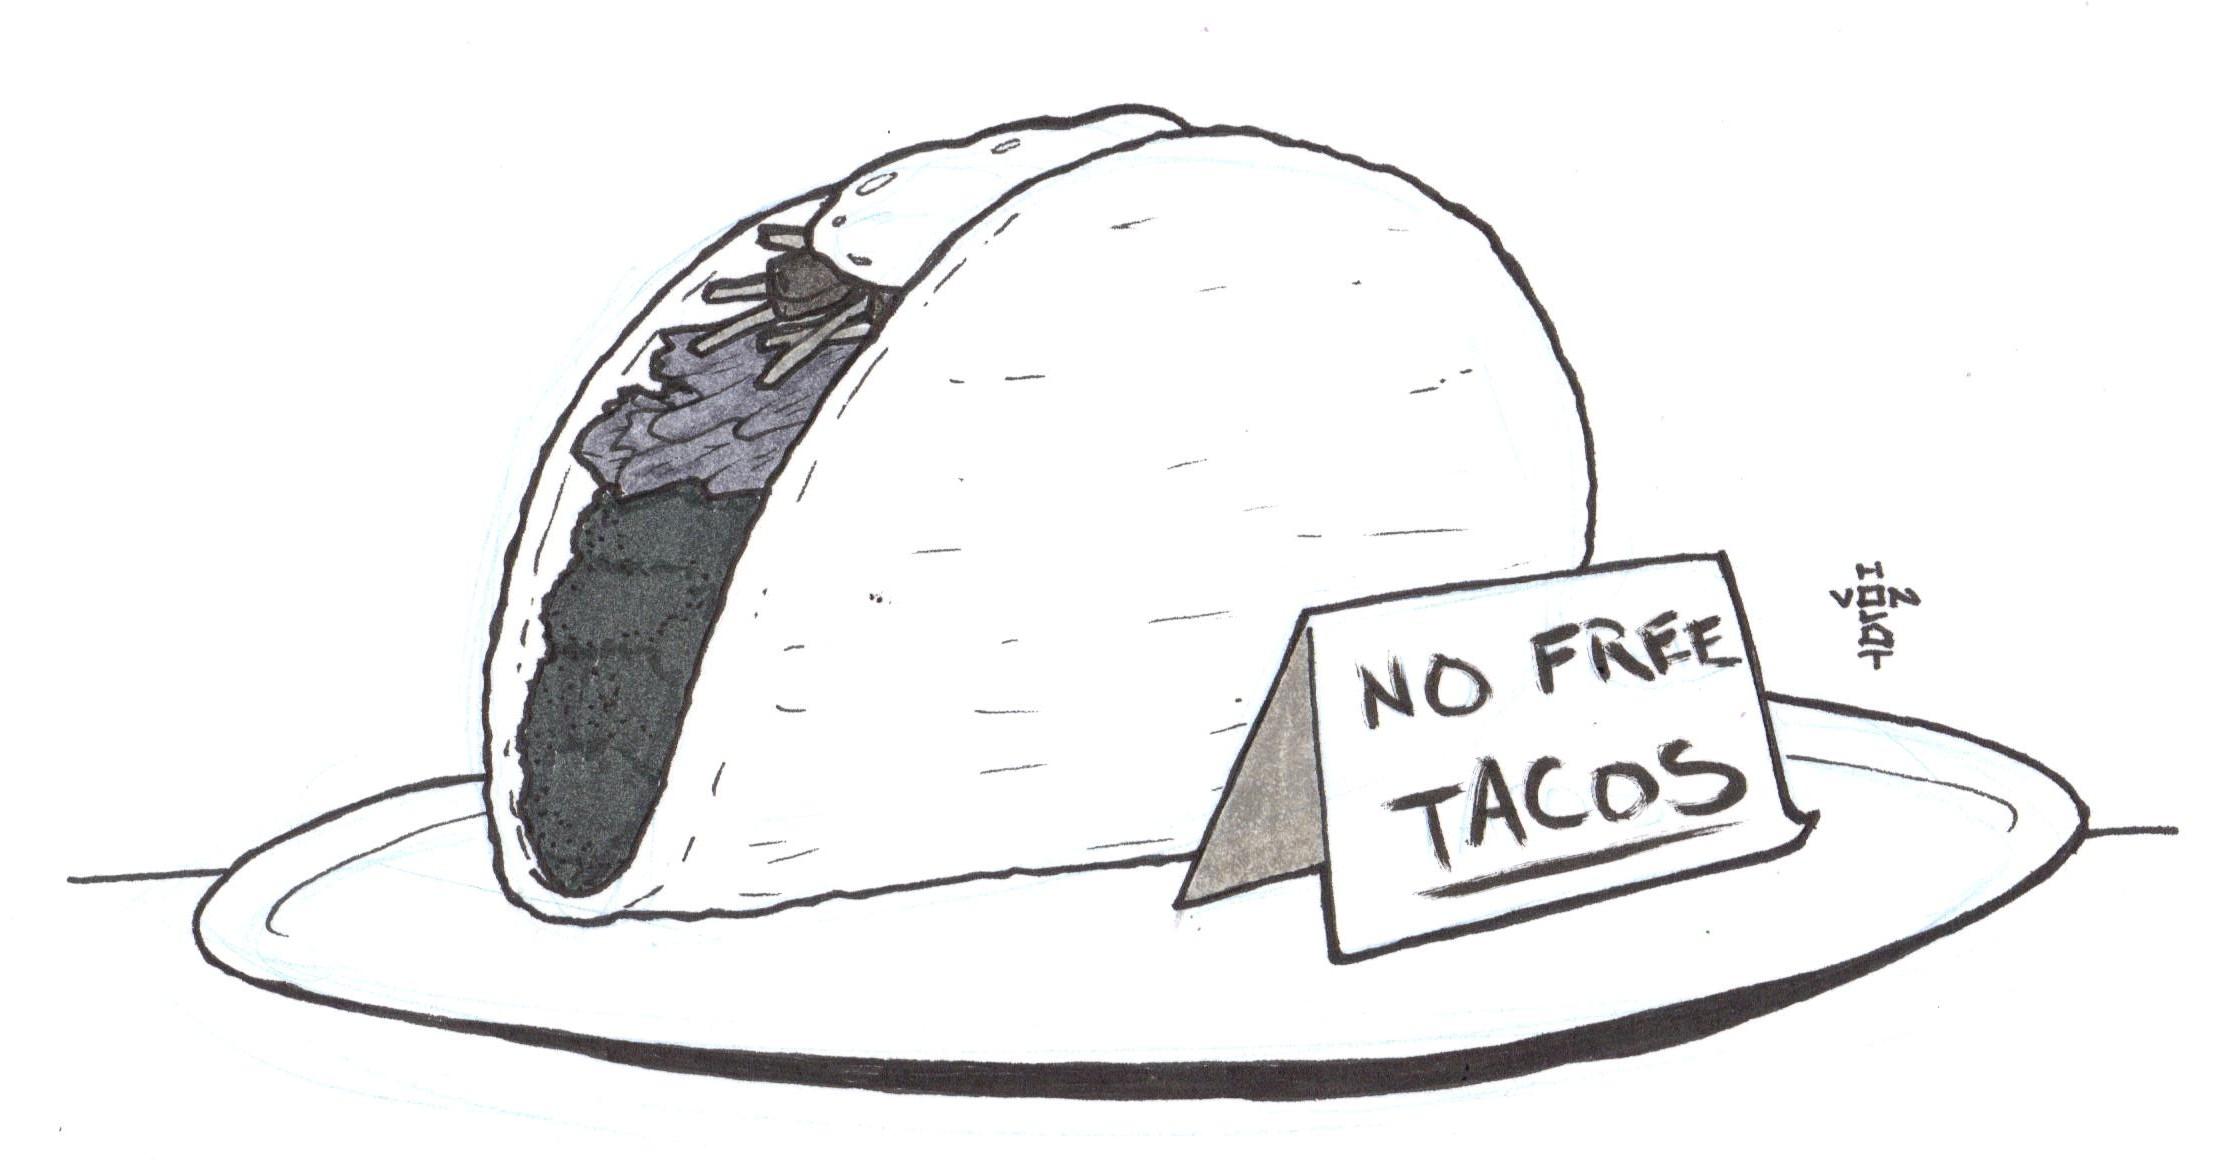 Doodle 781 No Free Tacos